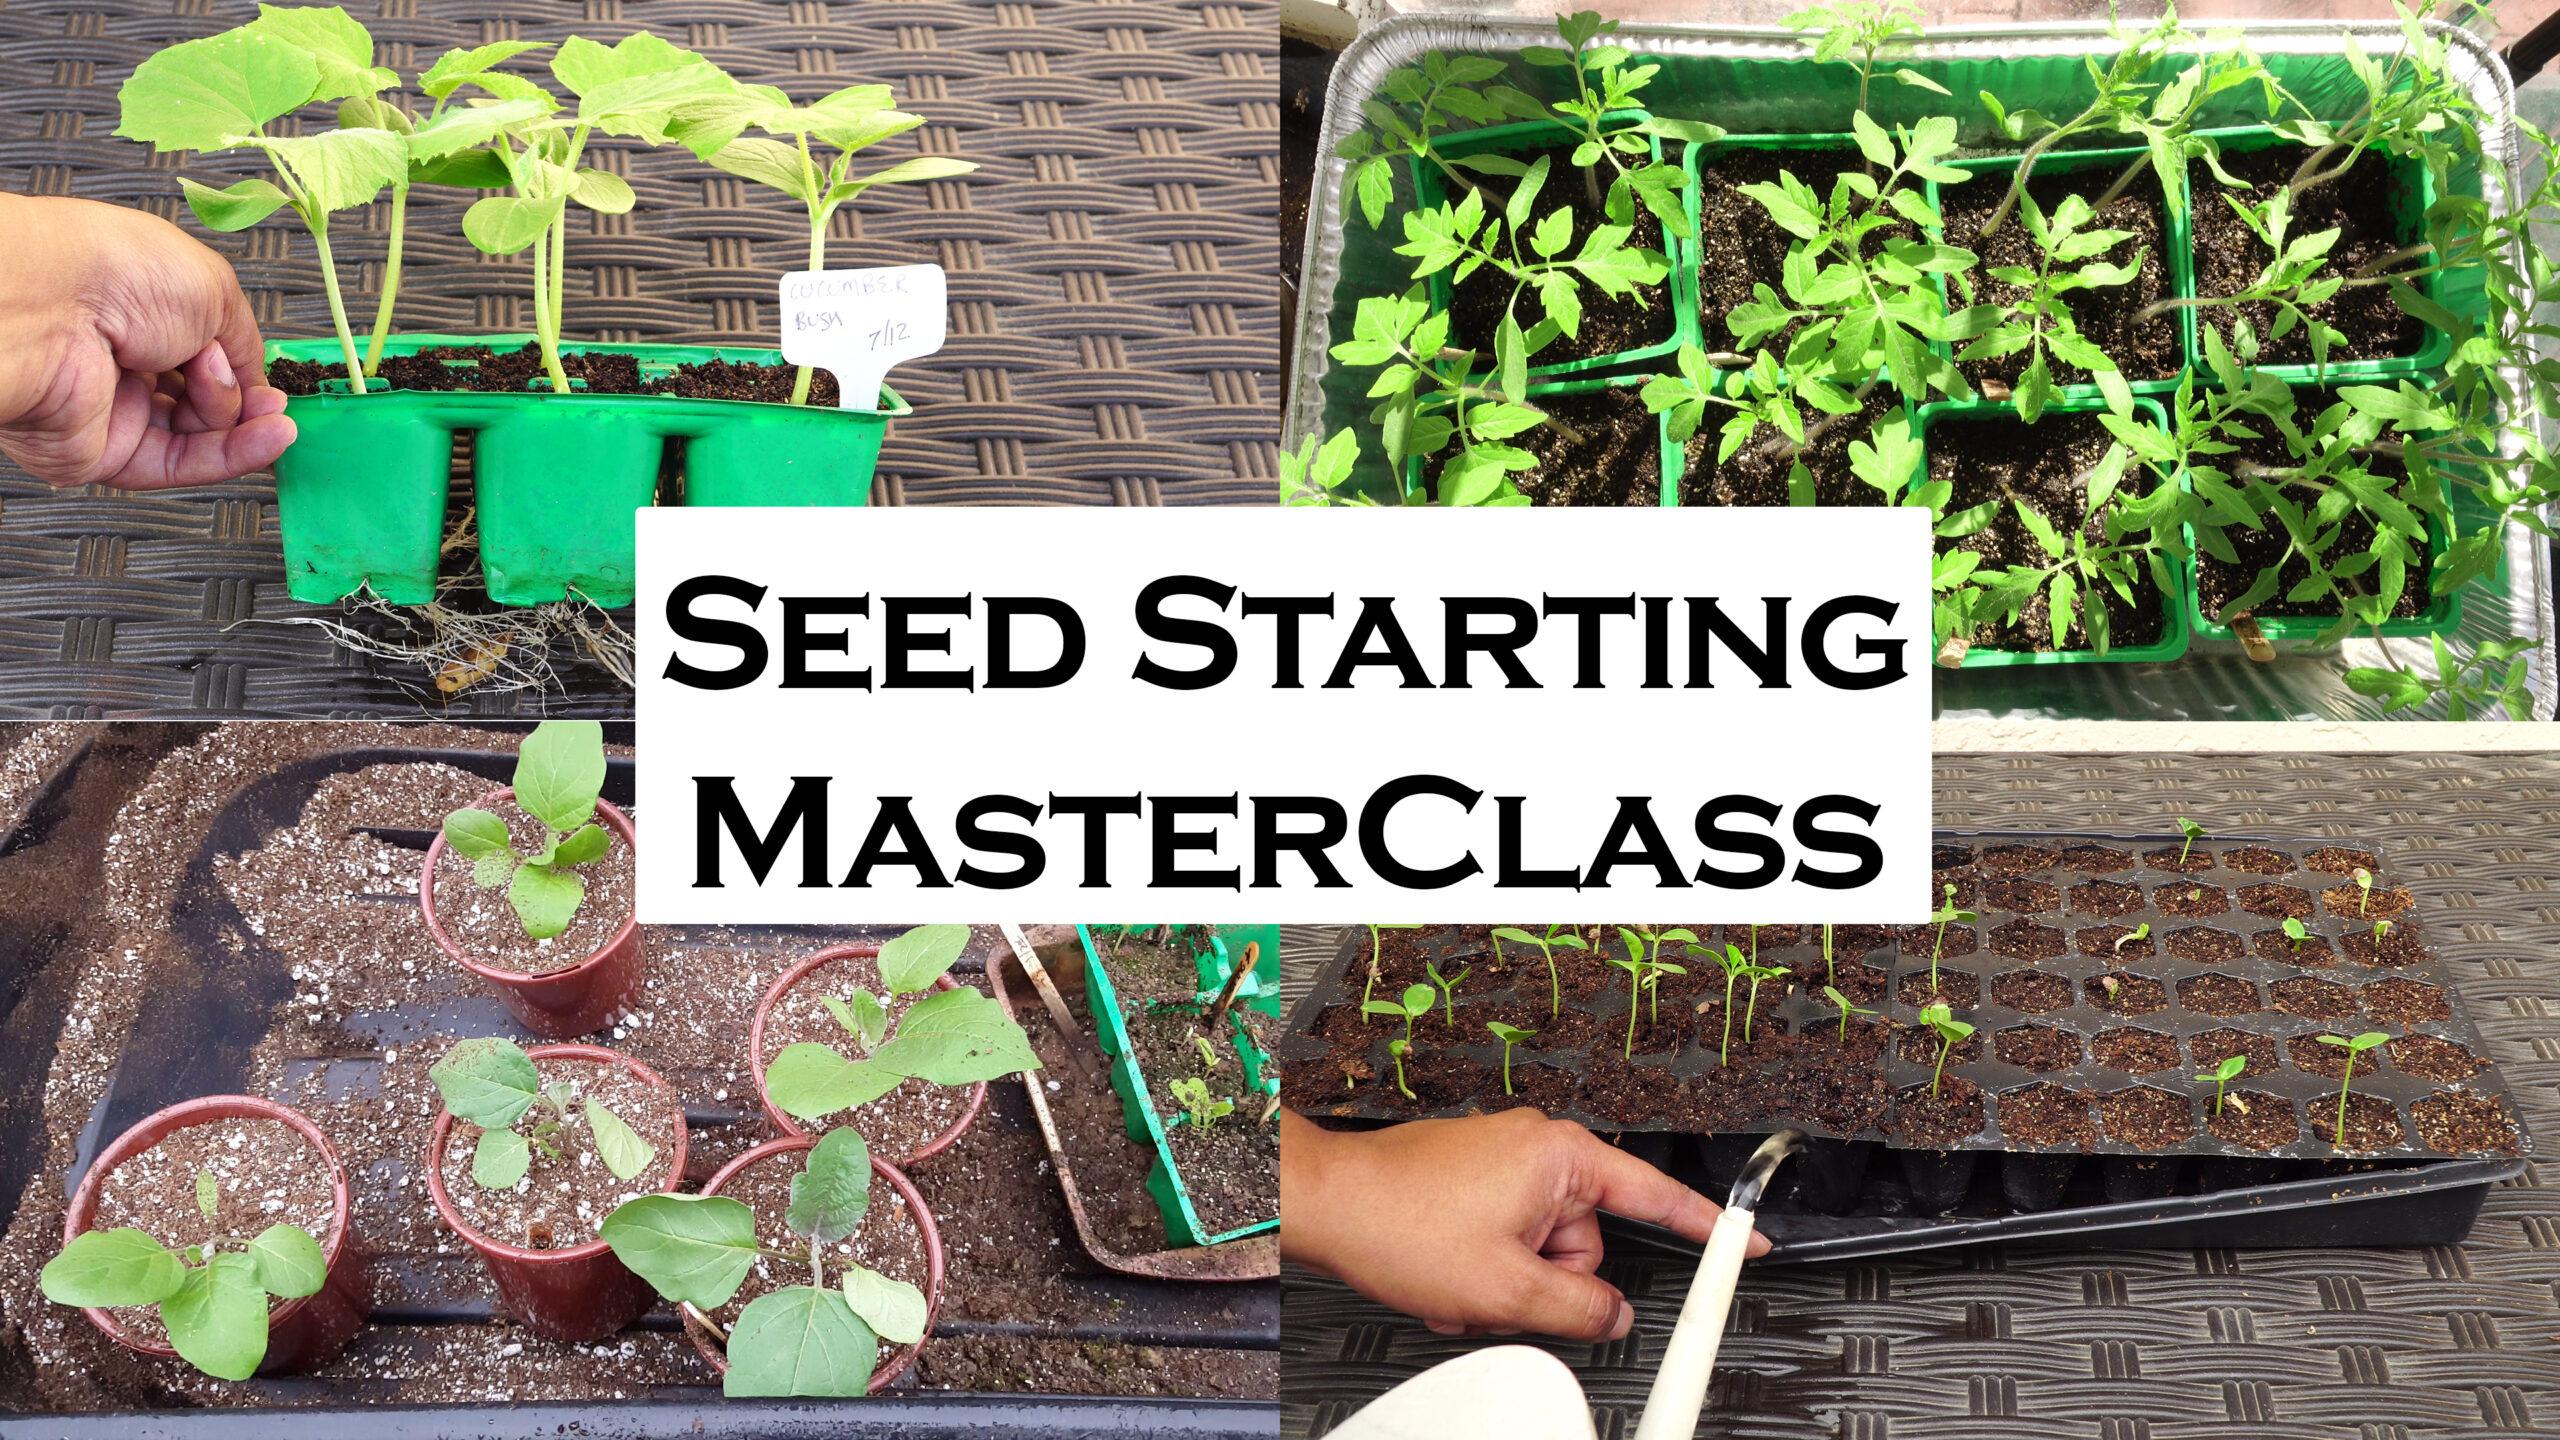 Plant Propagation – Seed Starting, Fertilizer For Seedlings, Transplanting Plants Masterclass